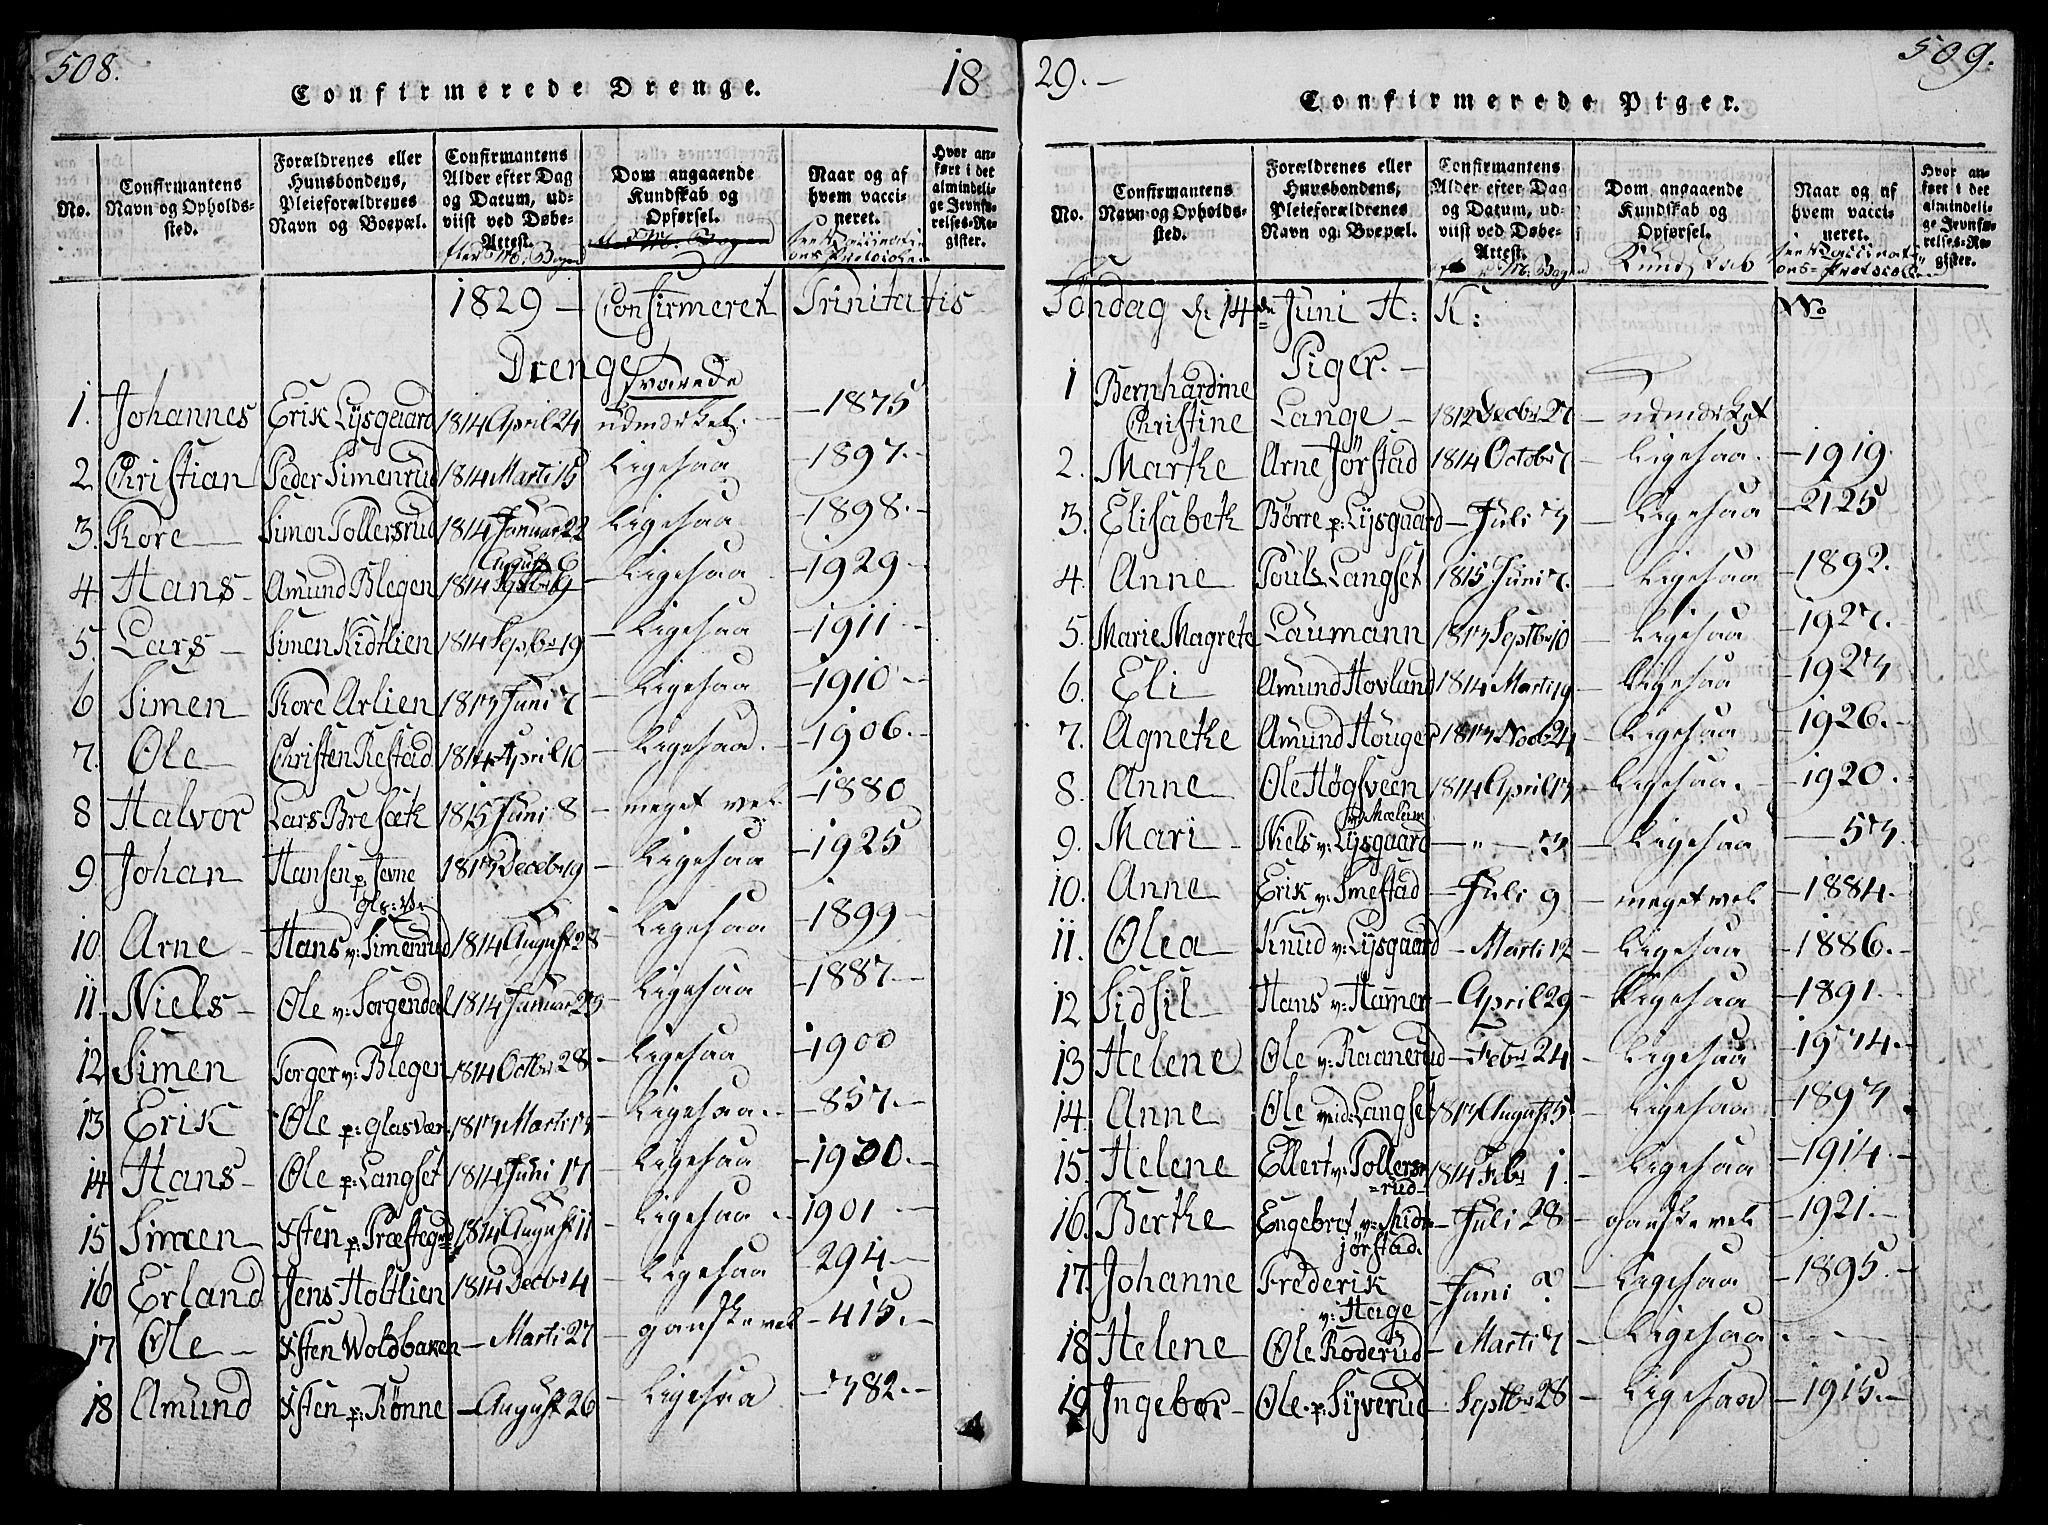 SAH, Fåberg prestekontor, Klokkerbok nr. 4, 1818-1837, s. 508-509